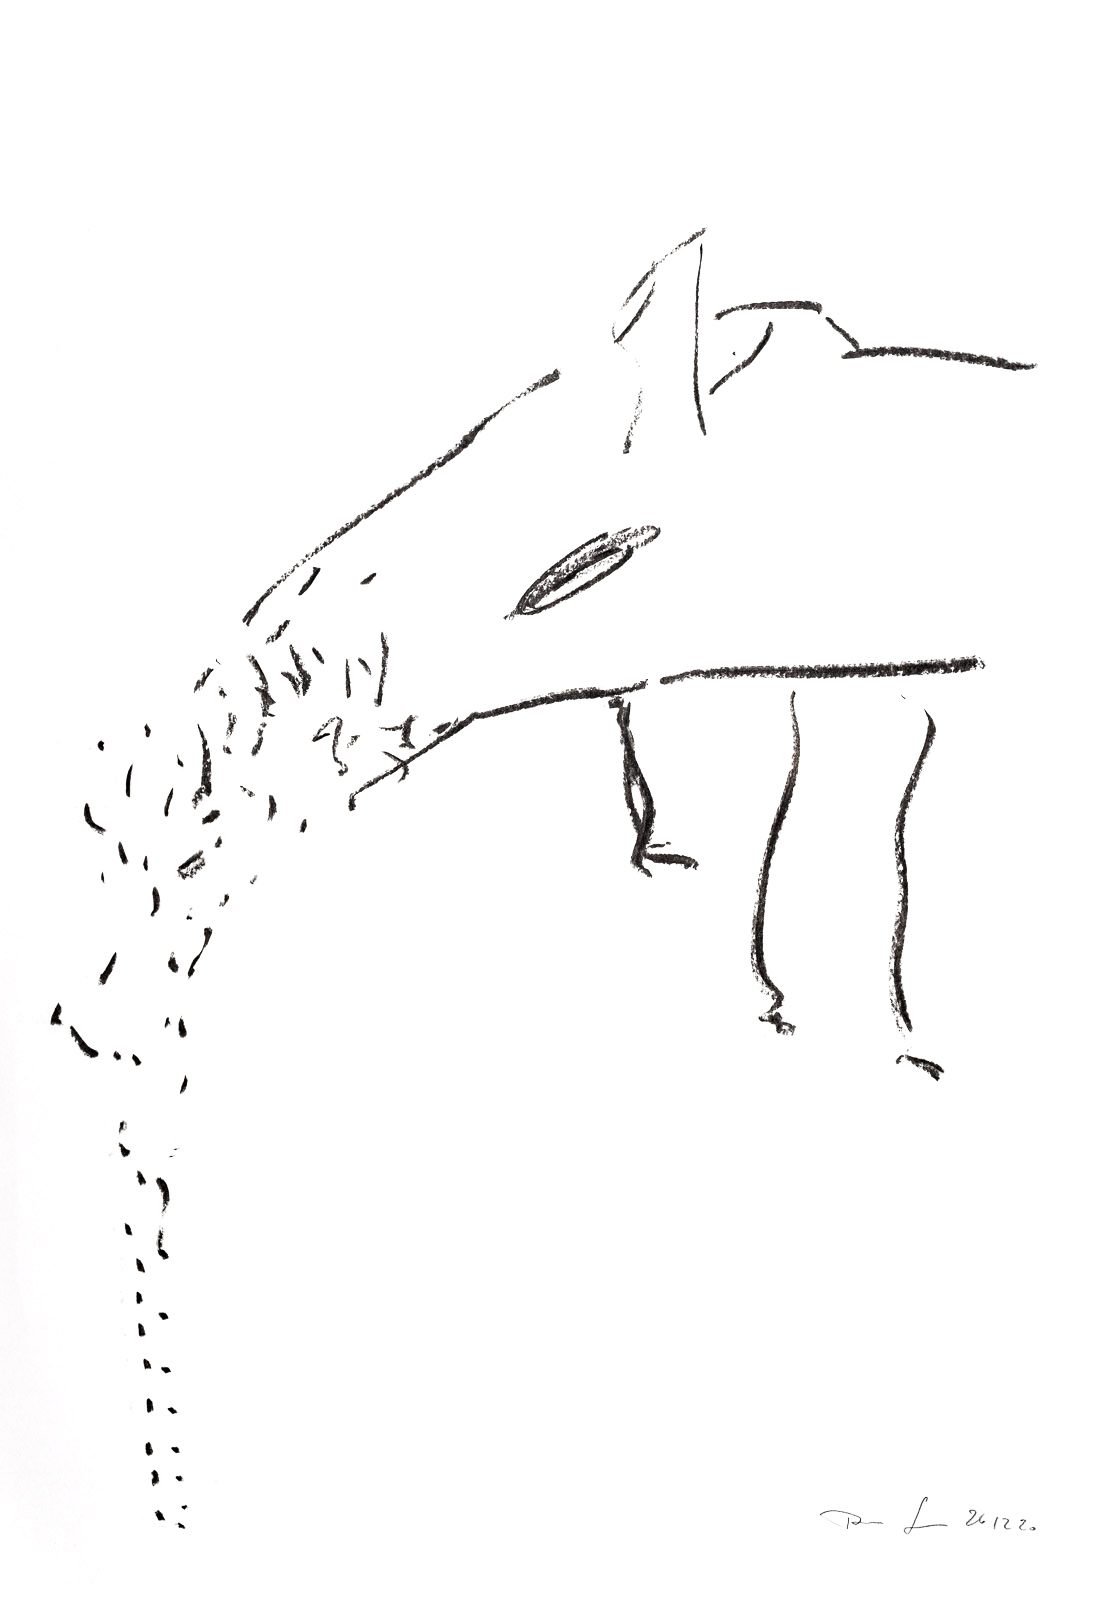 Thomas Sing Plenitudes Charcoal Drawings